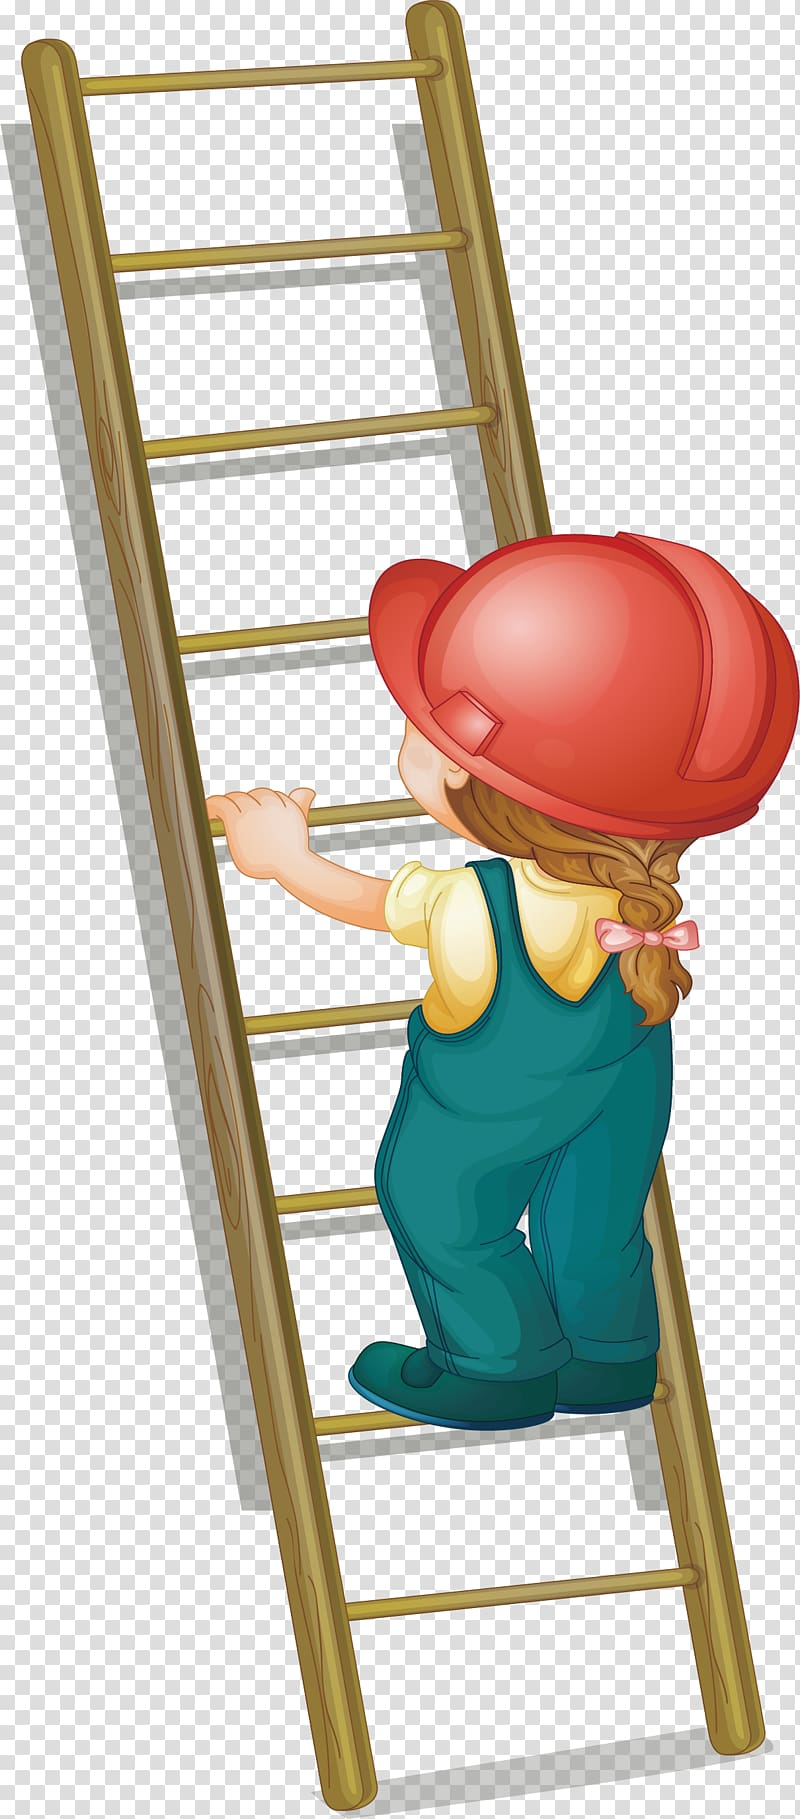 Child on ladder clipart freeuse library Ladder Illustration, Step on the ladder up transparent background ... freeuse library